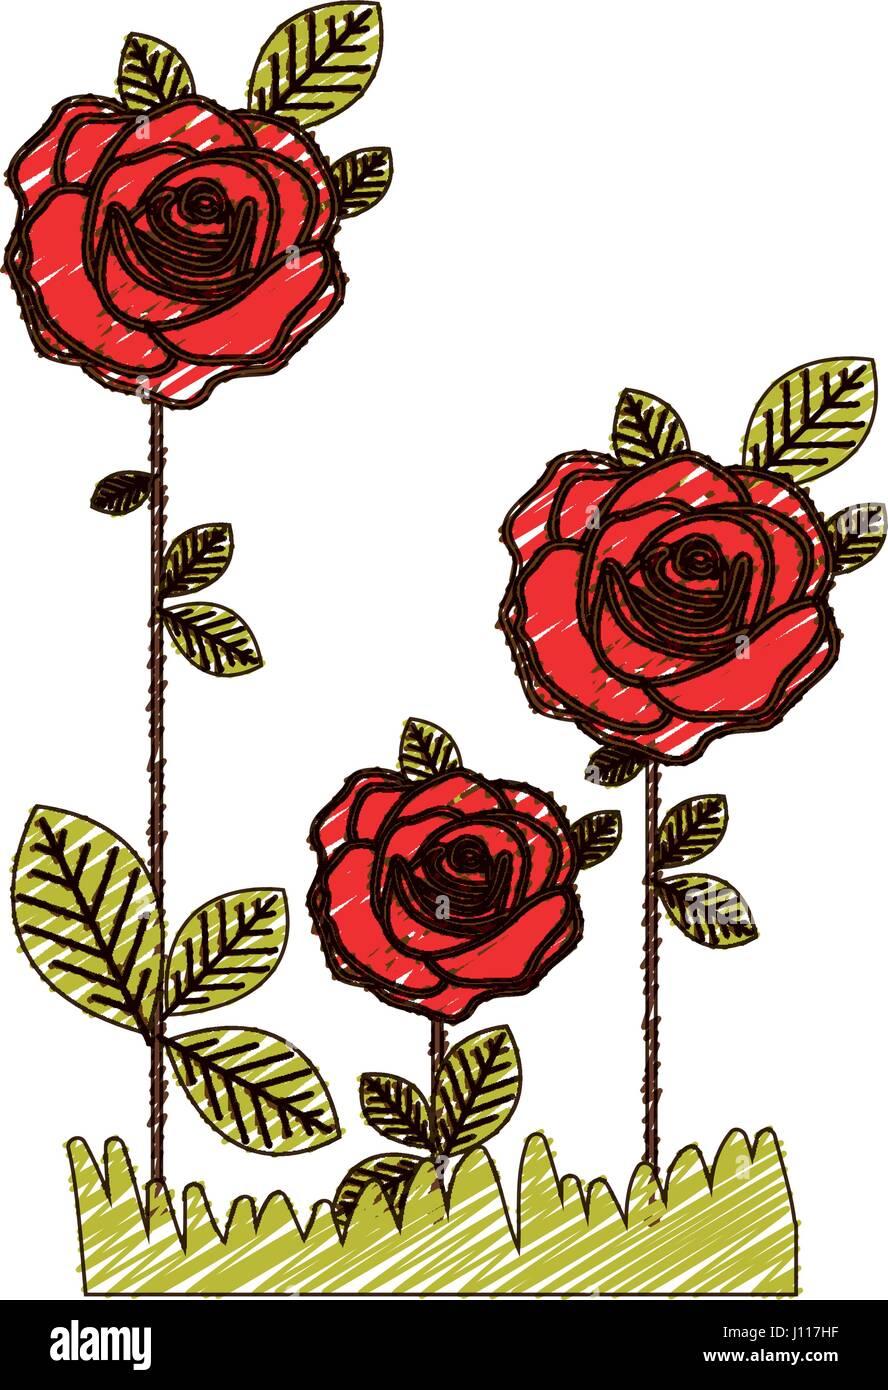 Color Pencil Drawing Roses Bouquet Stock Photos & Color Pencil ...